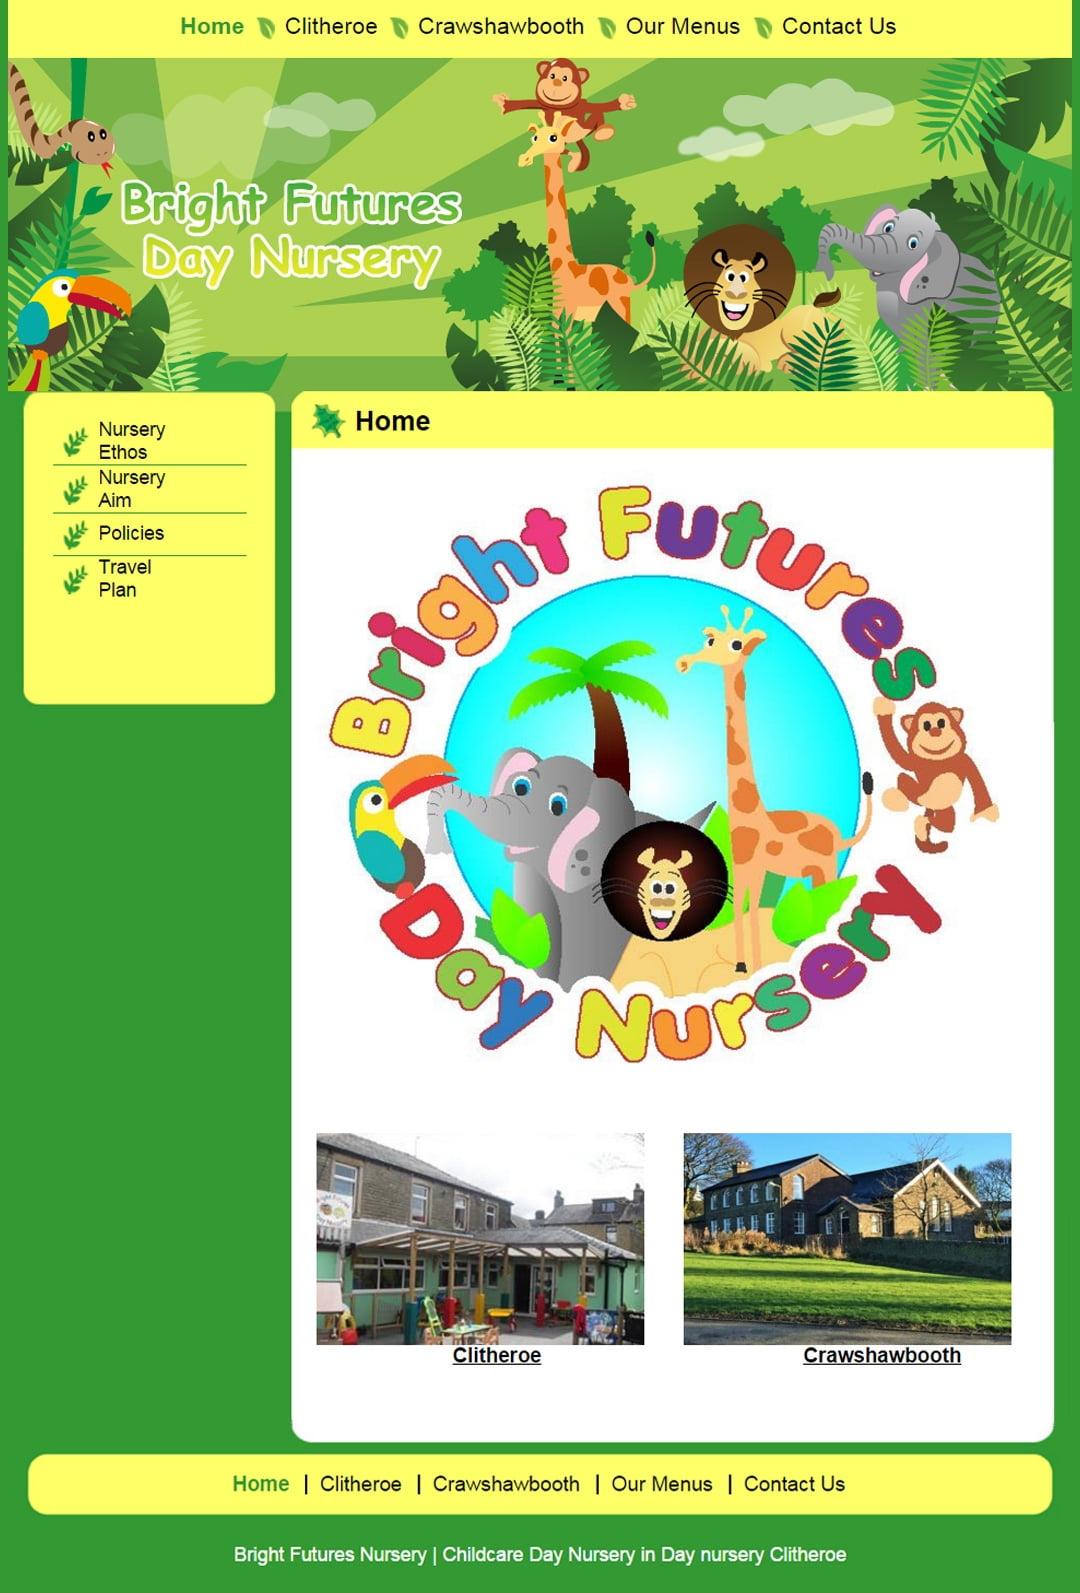 Bright Futures Nursery